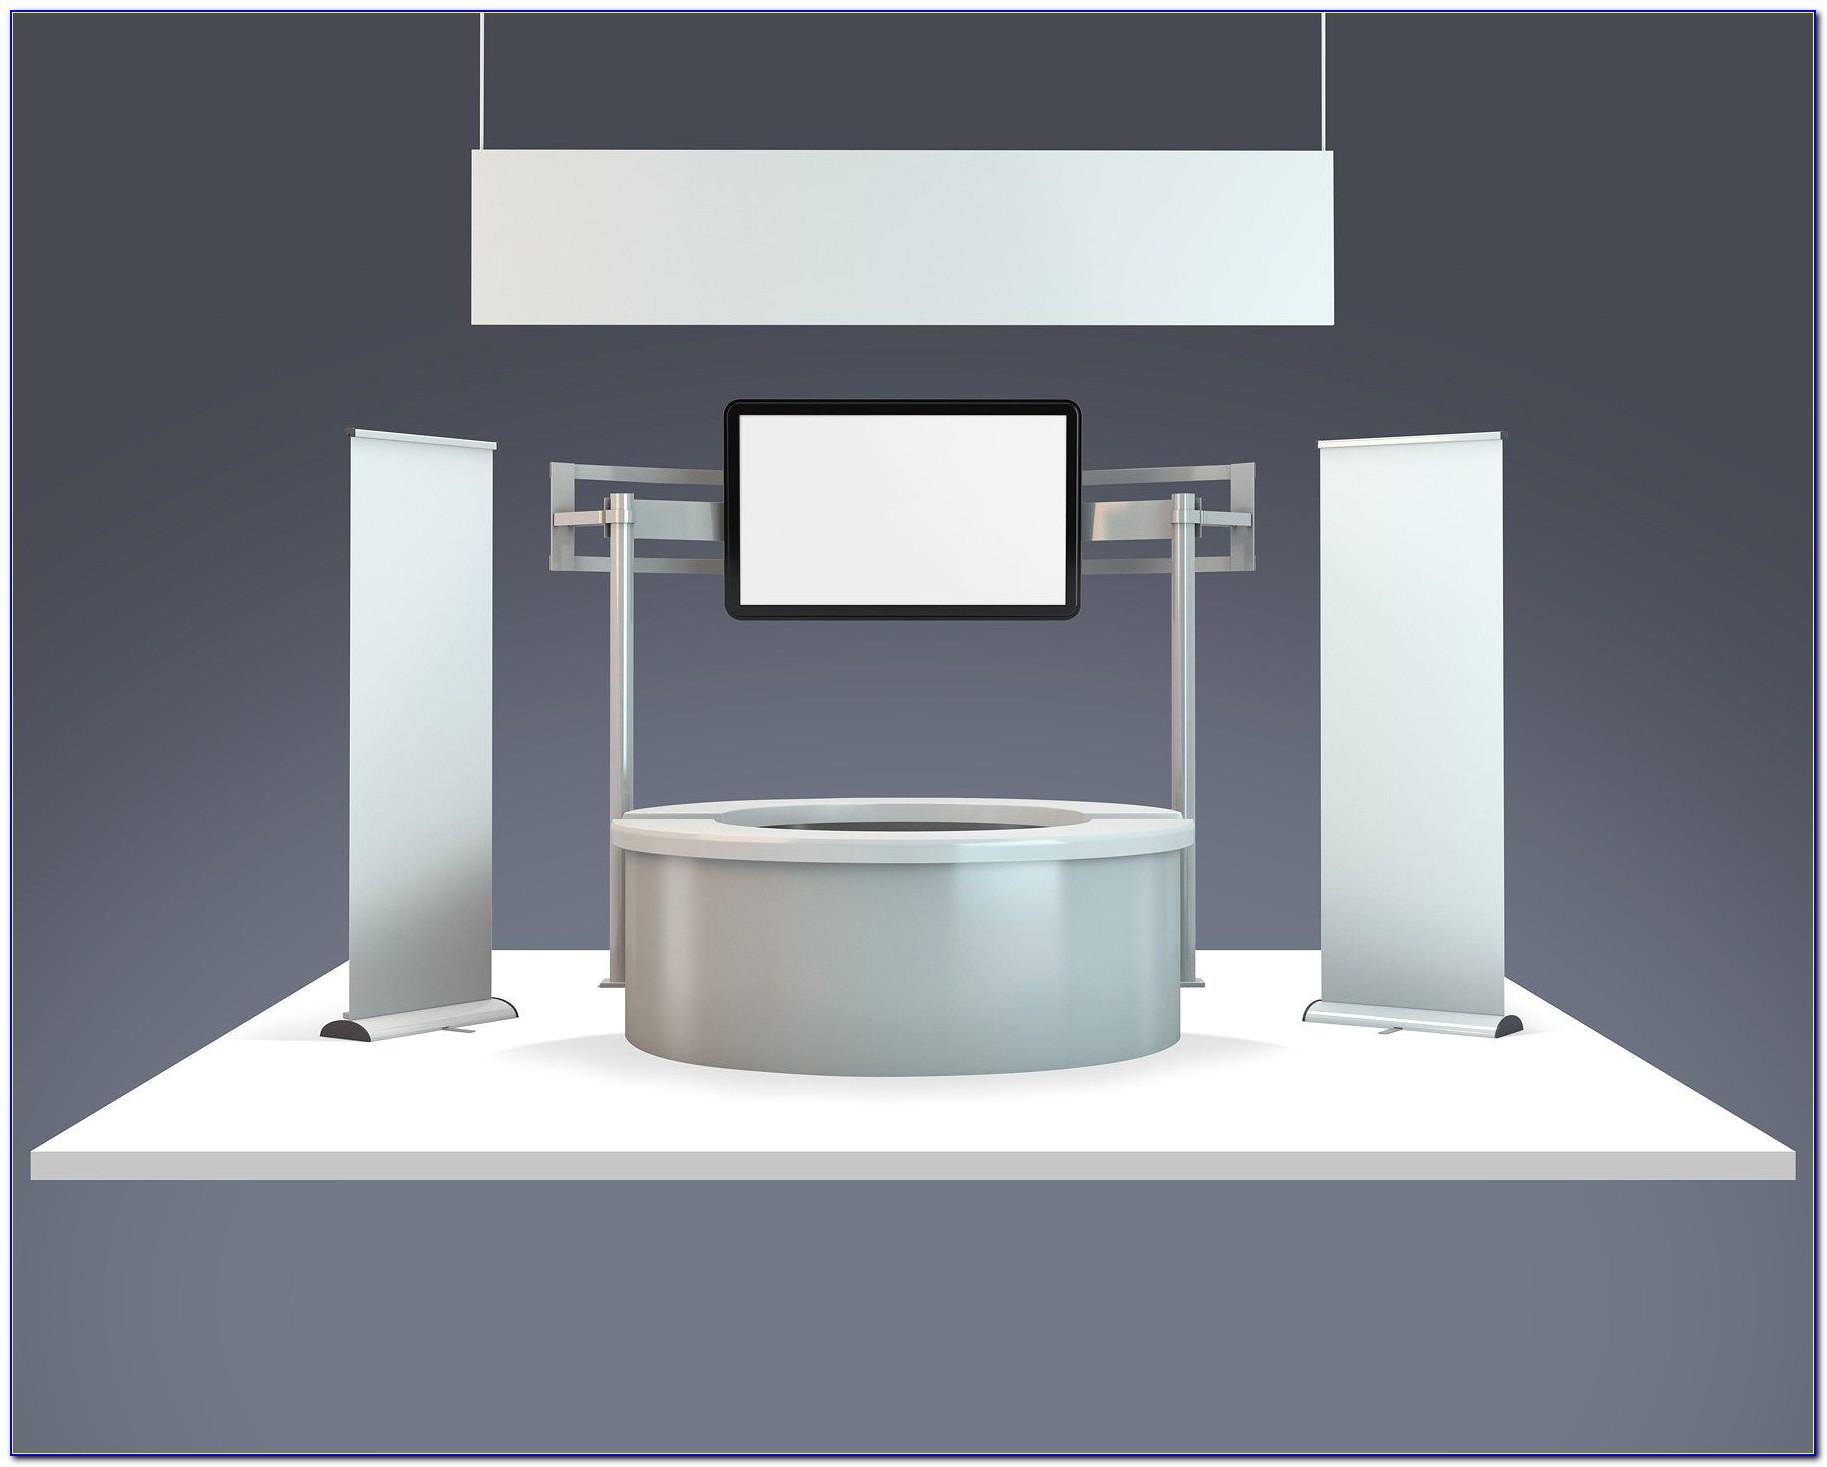 Trade Show Display Design Template